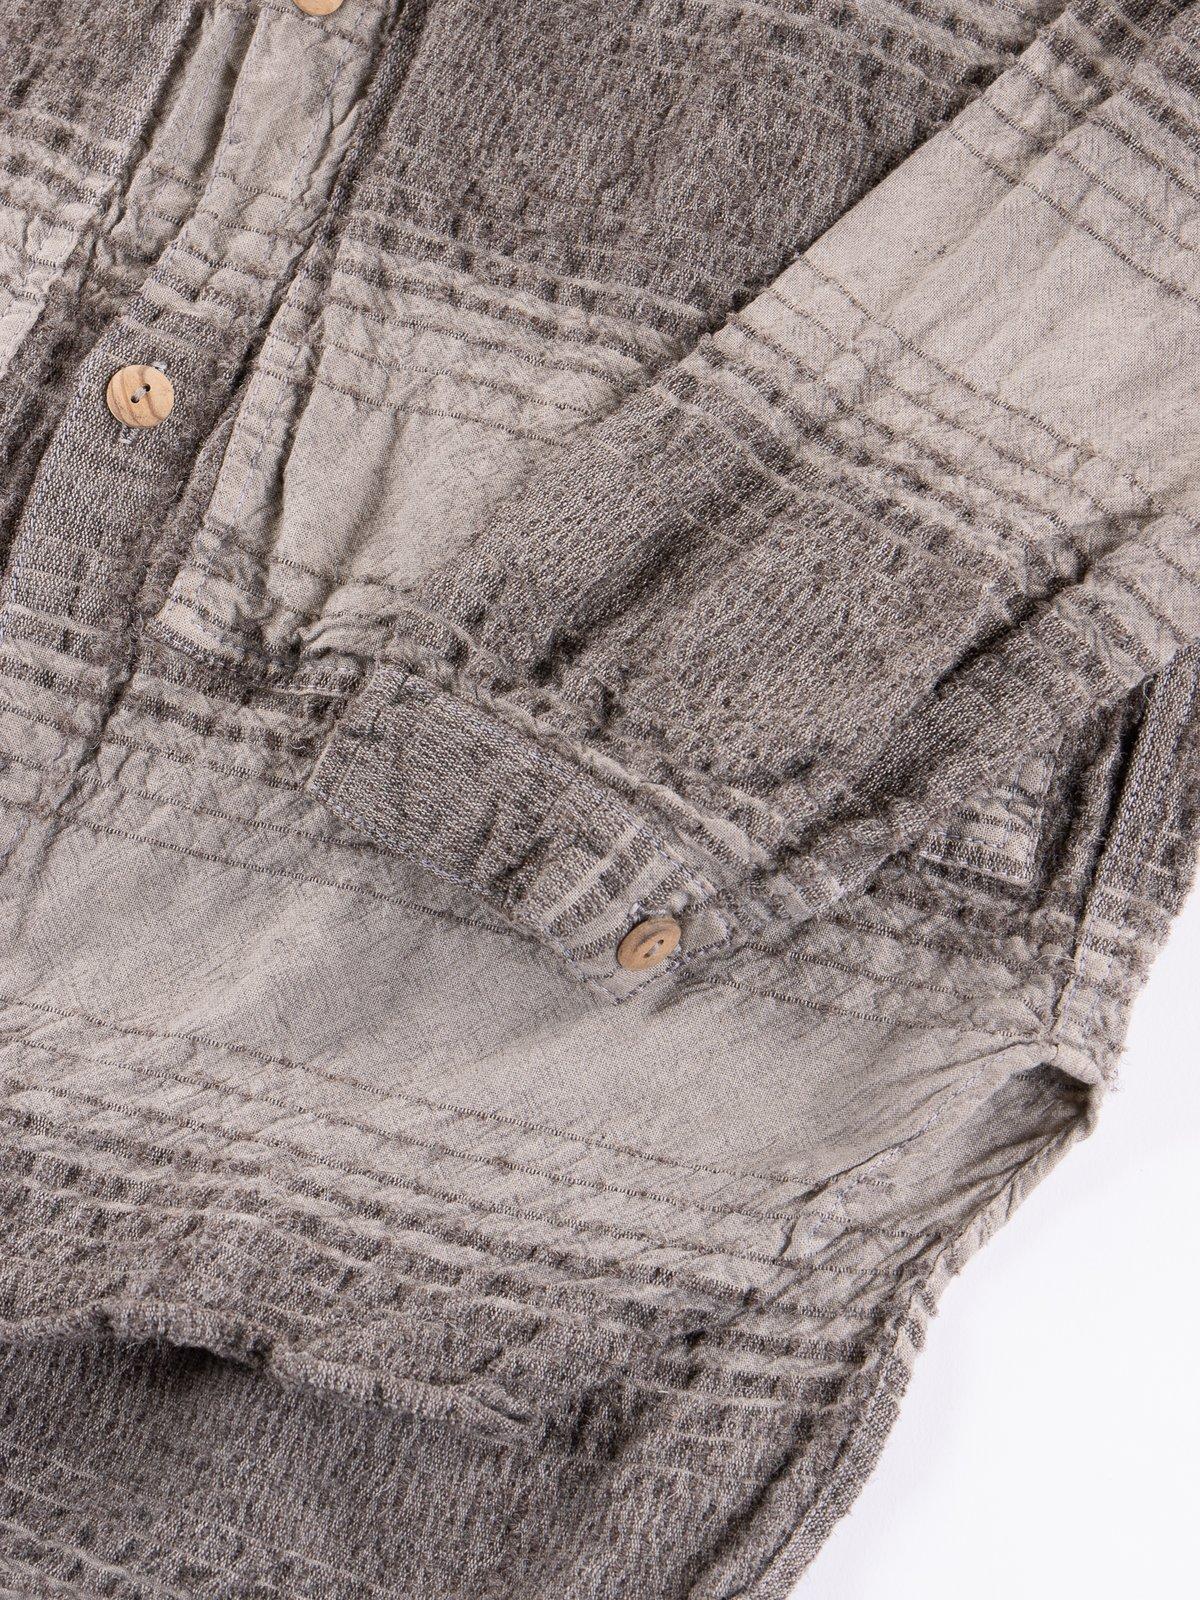 Indian Black Dye Doppler Stripe Calico Periscope Pocket Tail Shirt - Image 5